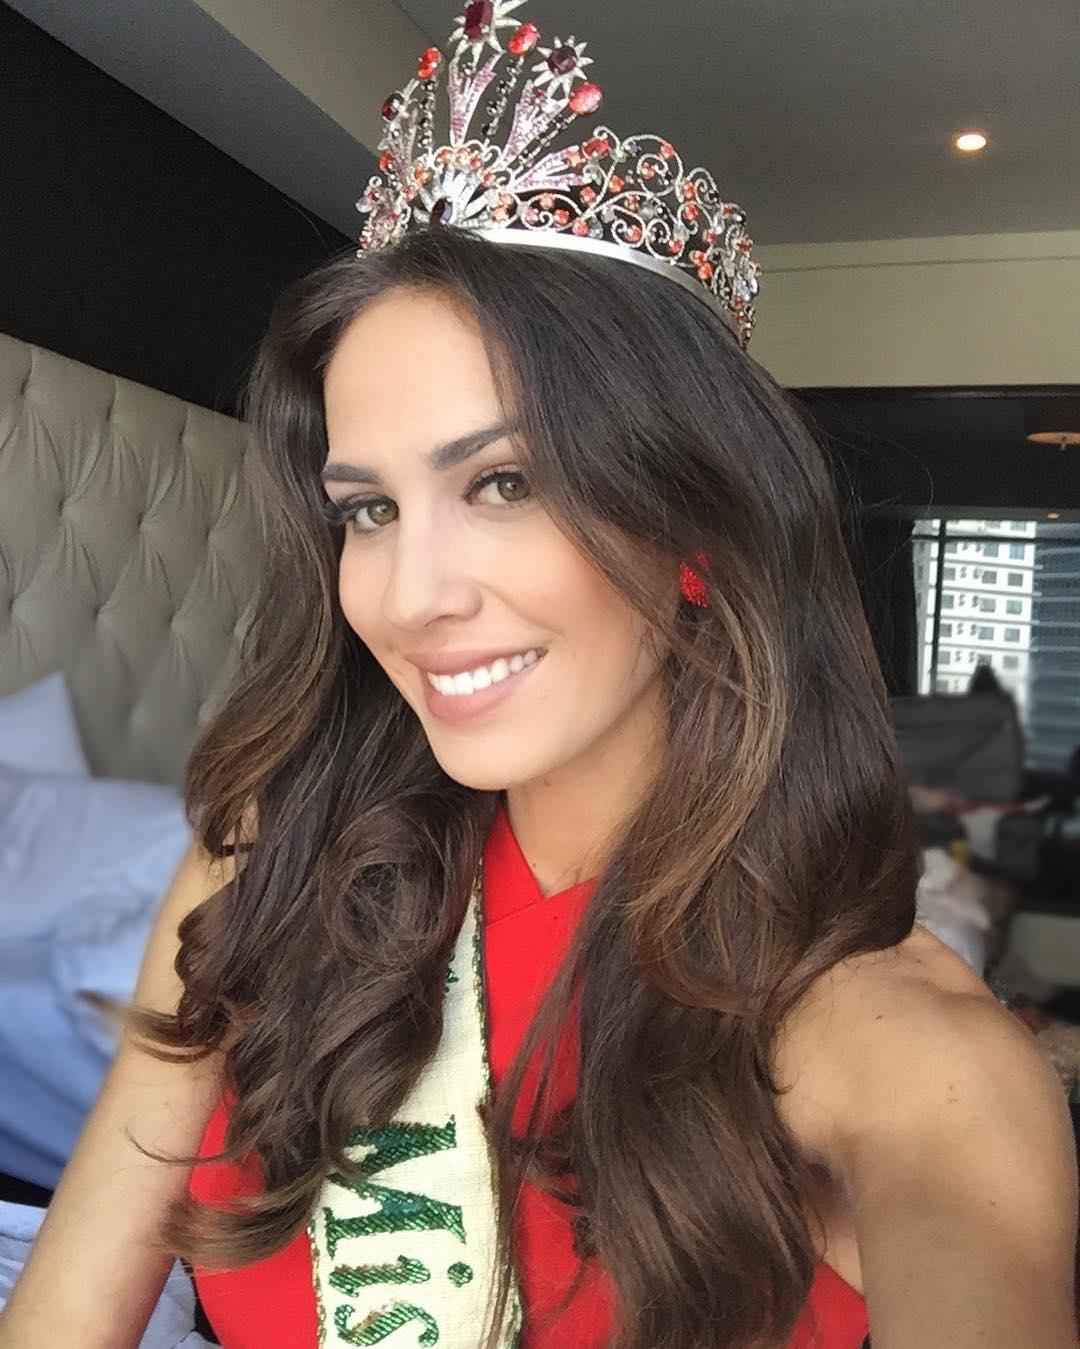 bruna zanardo, 1st runner-up de miss supranational brazil 2020/miss brasil internacional 2017/miss brasil terra 2016. - Página 6 7ro7ihql